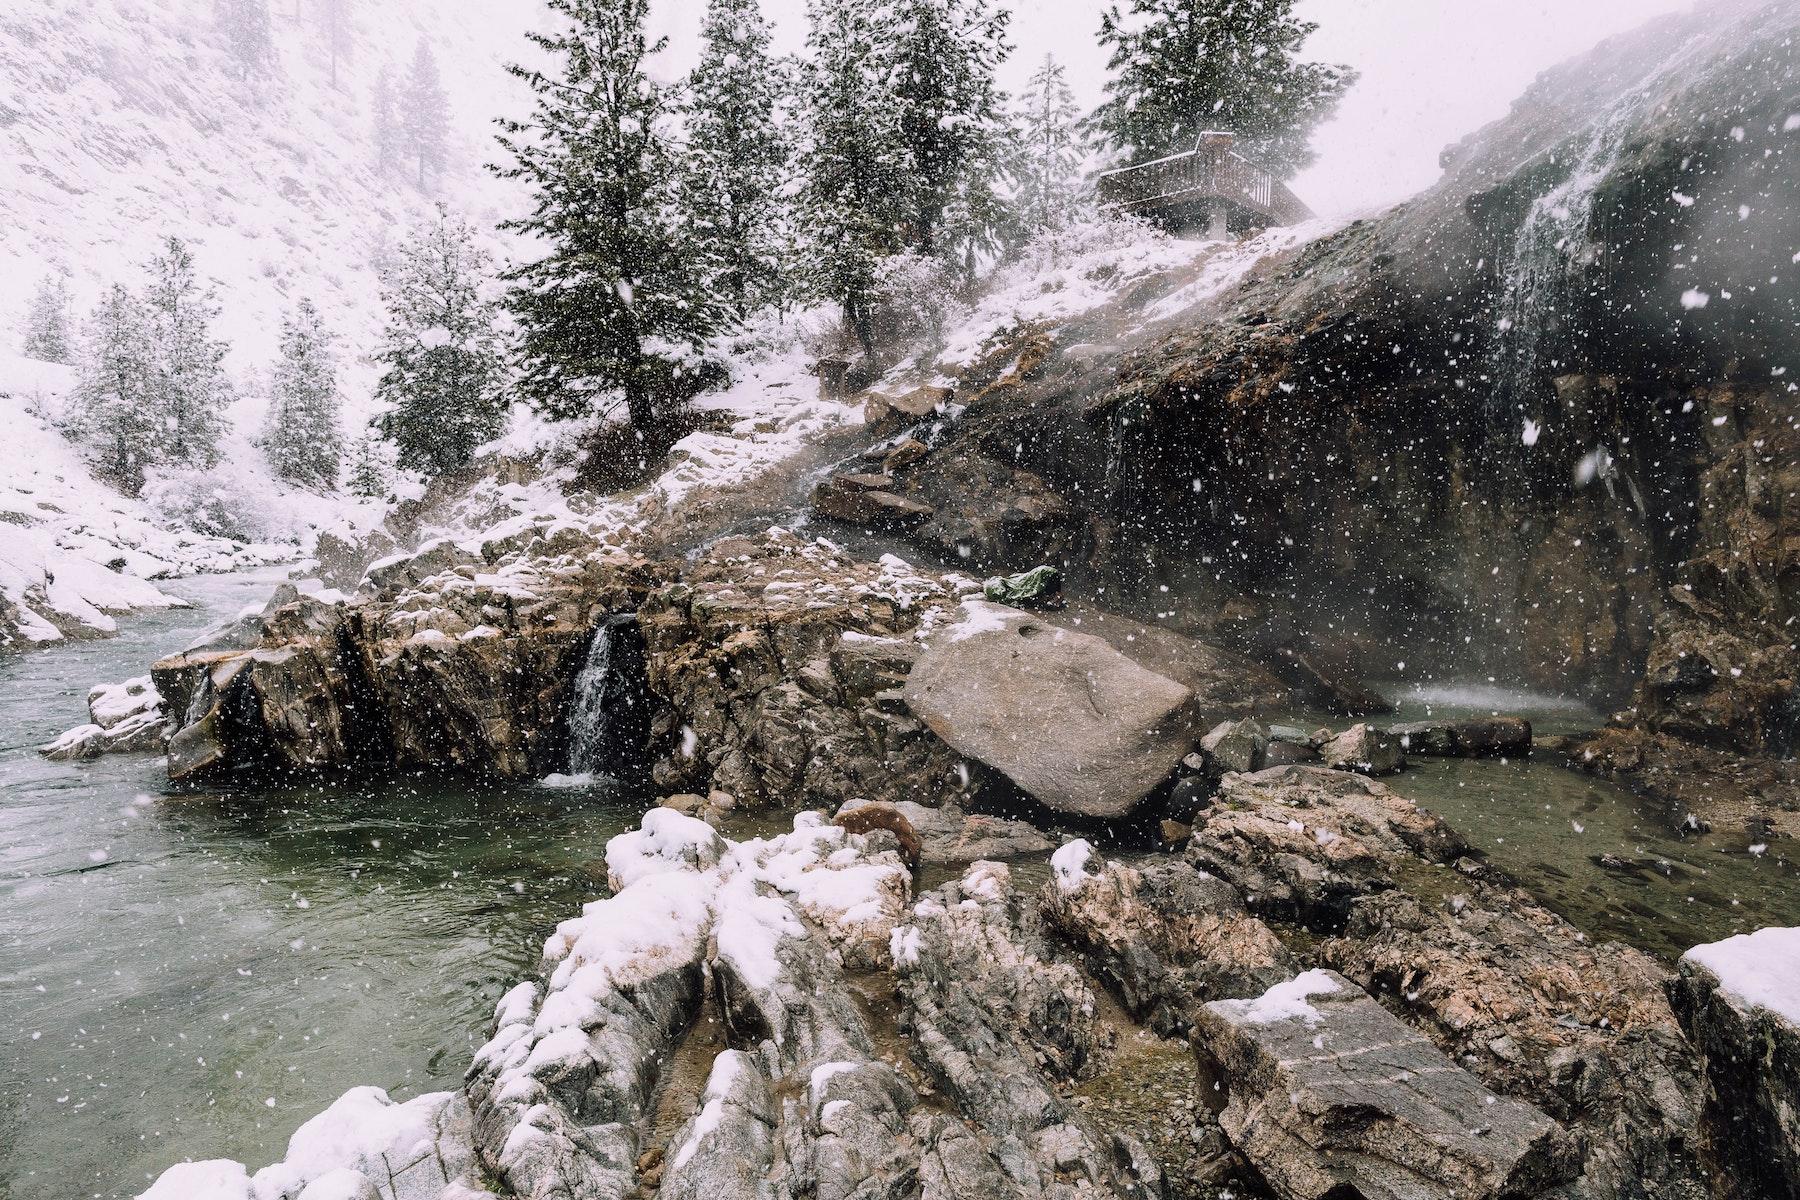 Soak in Kirkham Hot Springs, 7359 Idaho 21